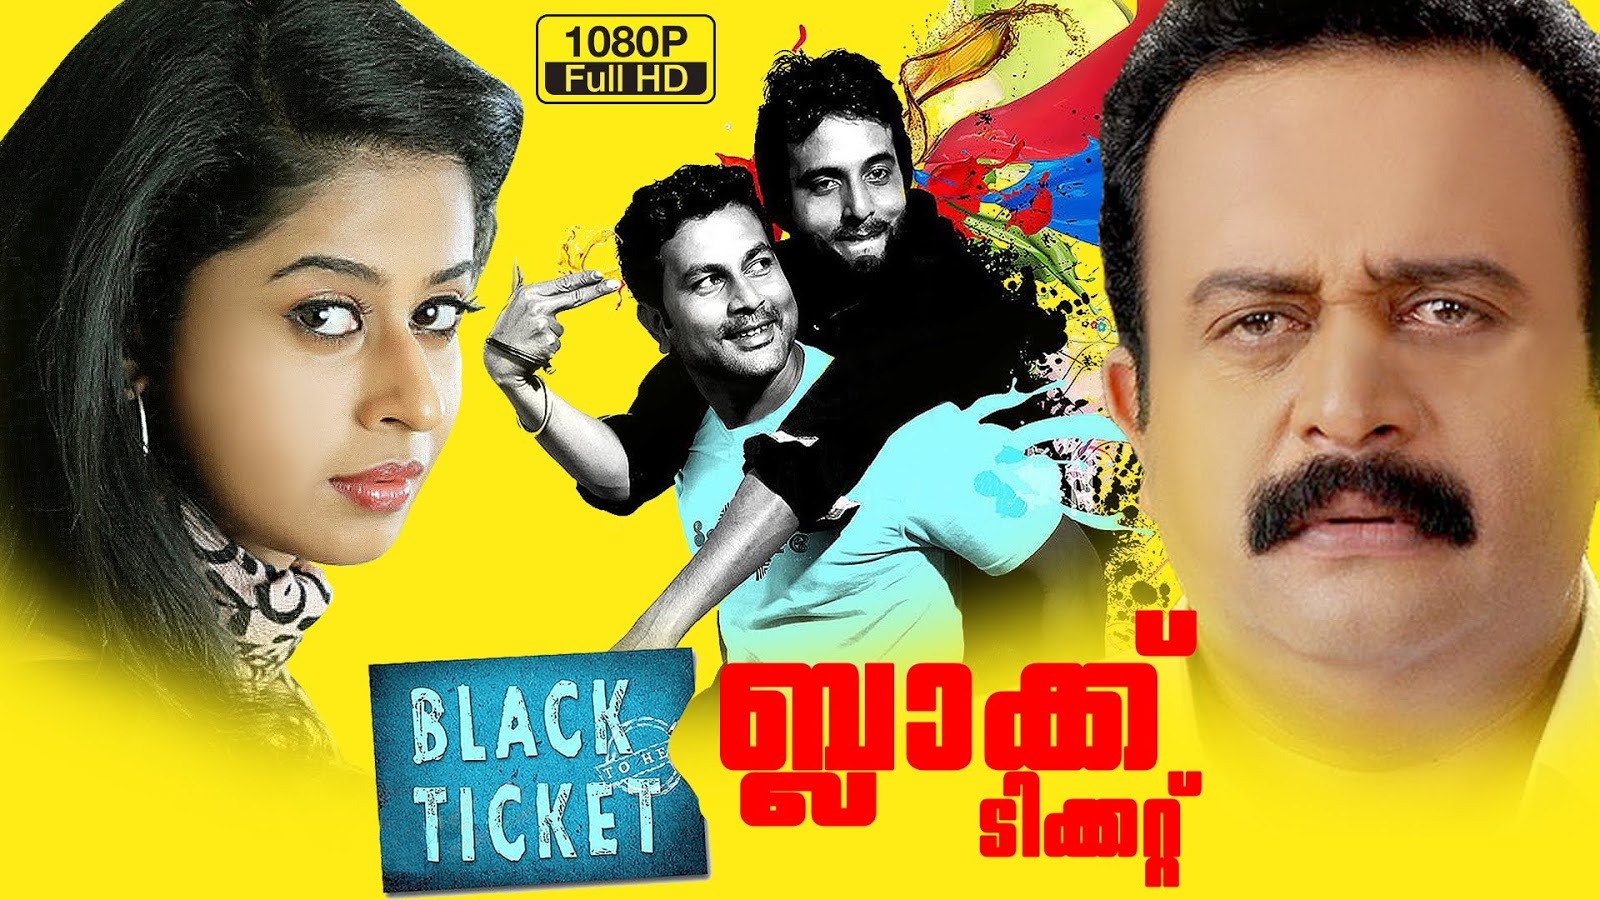 Watch Chota Leader (2016) DVDRip Malayalam Full Movie Watch Online Free Download